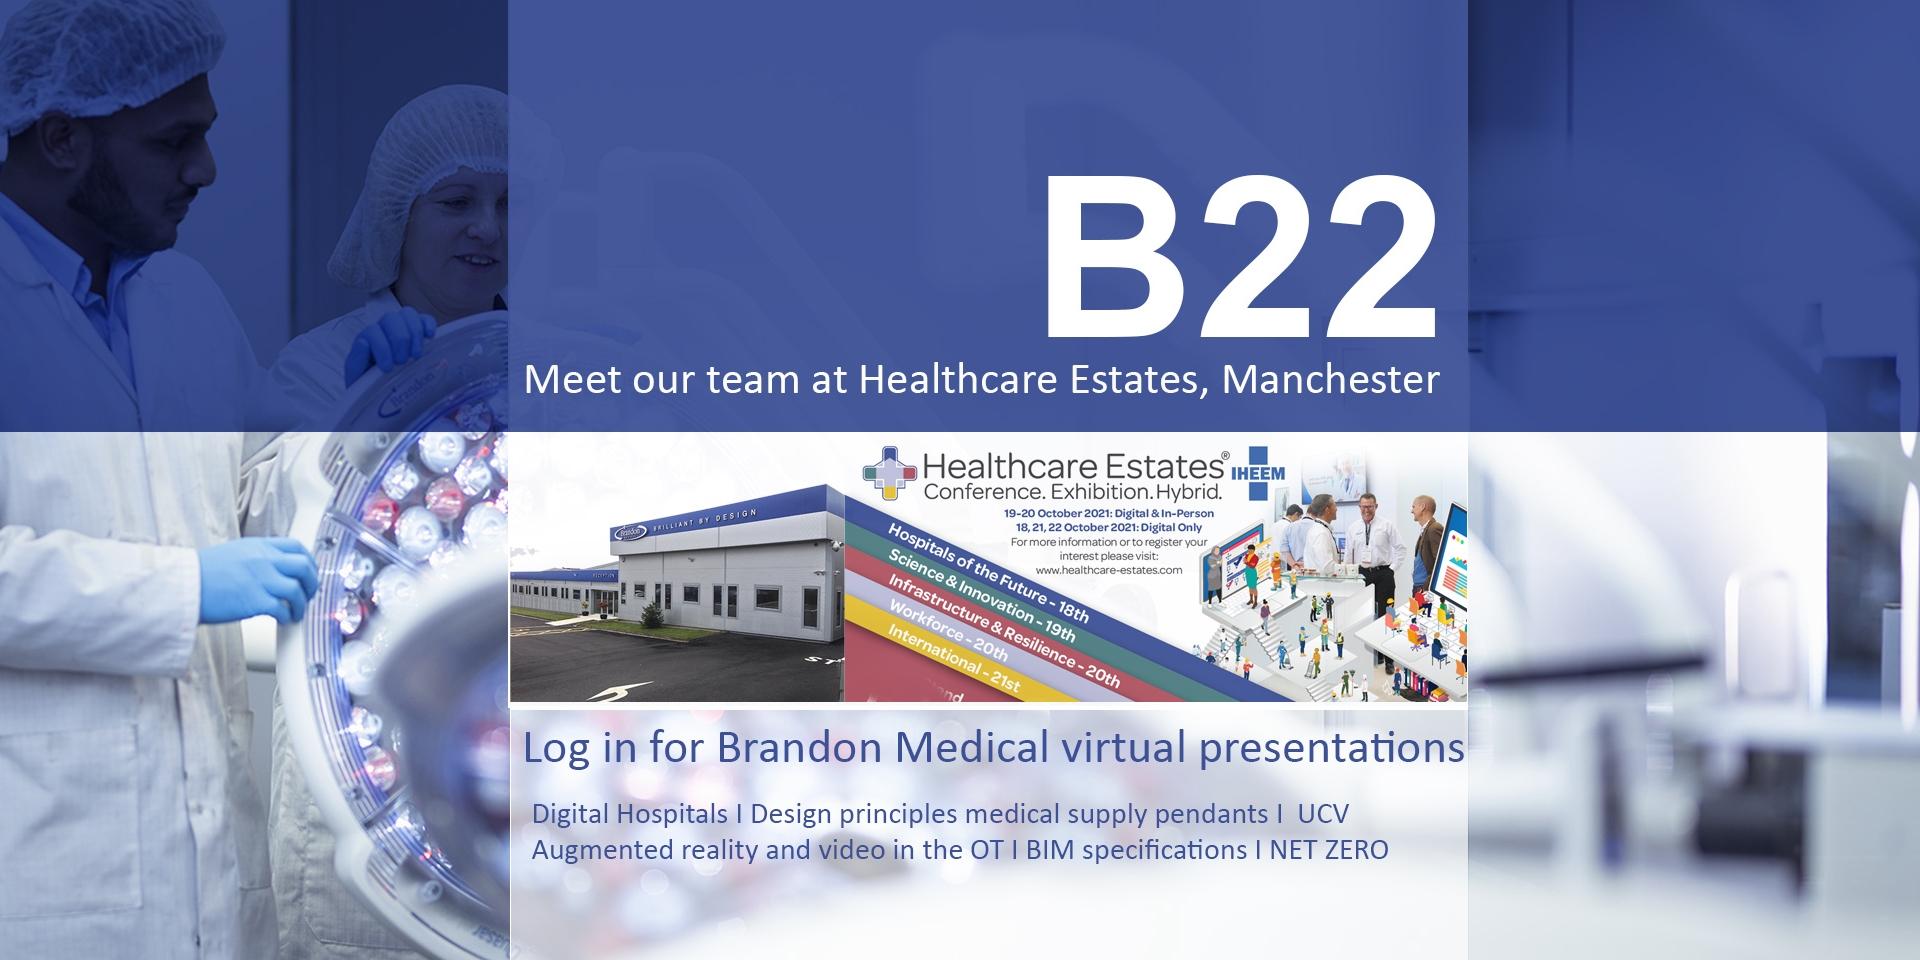 2 BRANDON MEDICAL Hhealthcare estates conference exhibition hybrid 2021